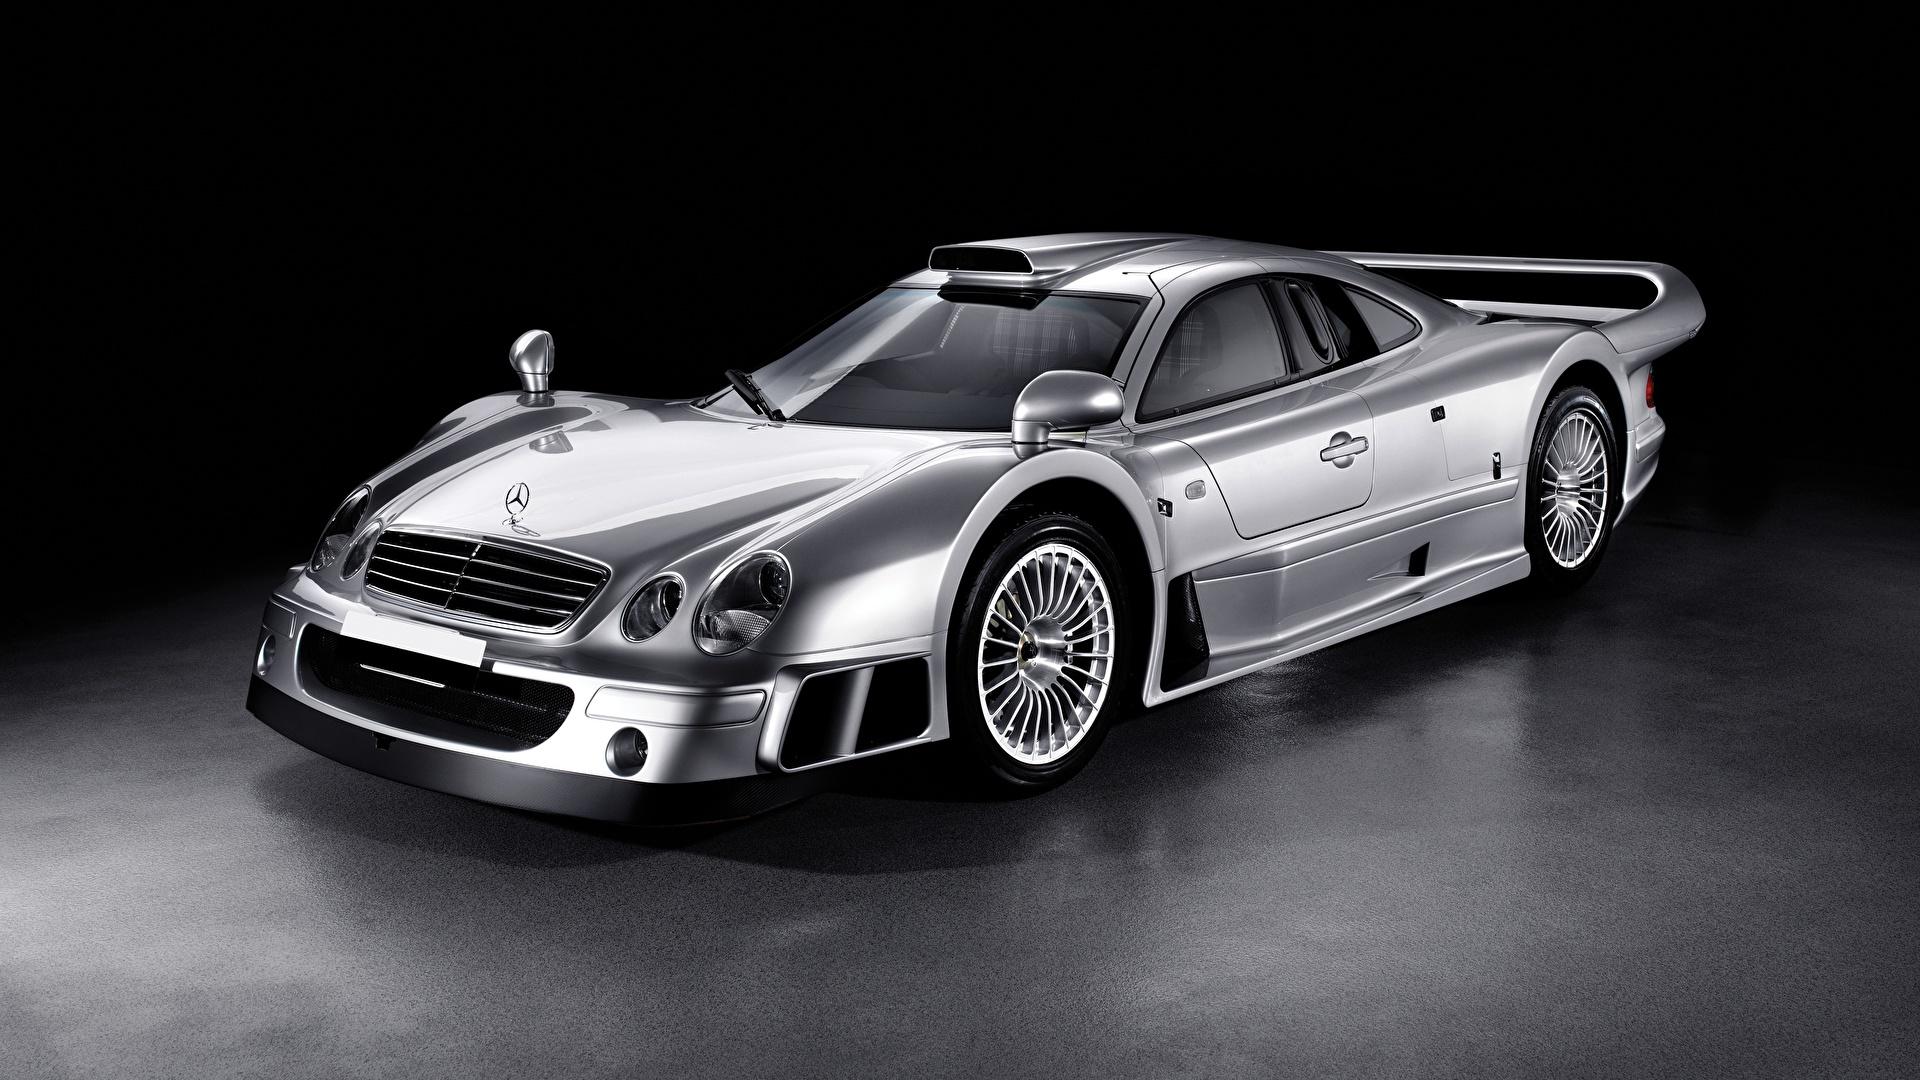 Fondos De Pantalla 2560x1440 Mercedes Benz 2005 Clk Gtr Amg